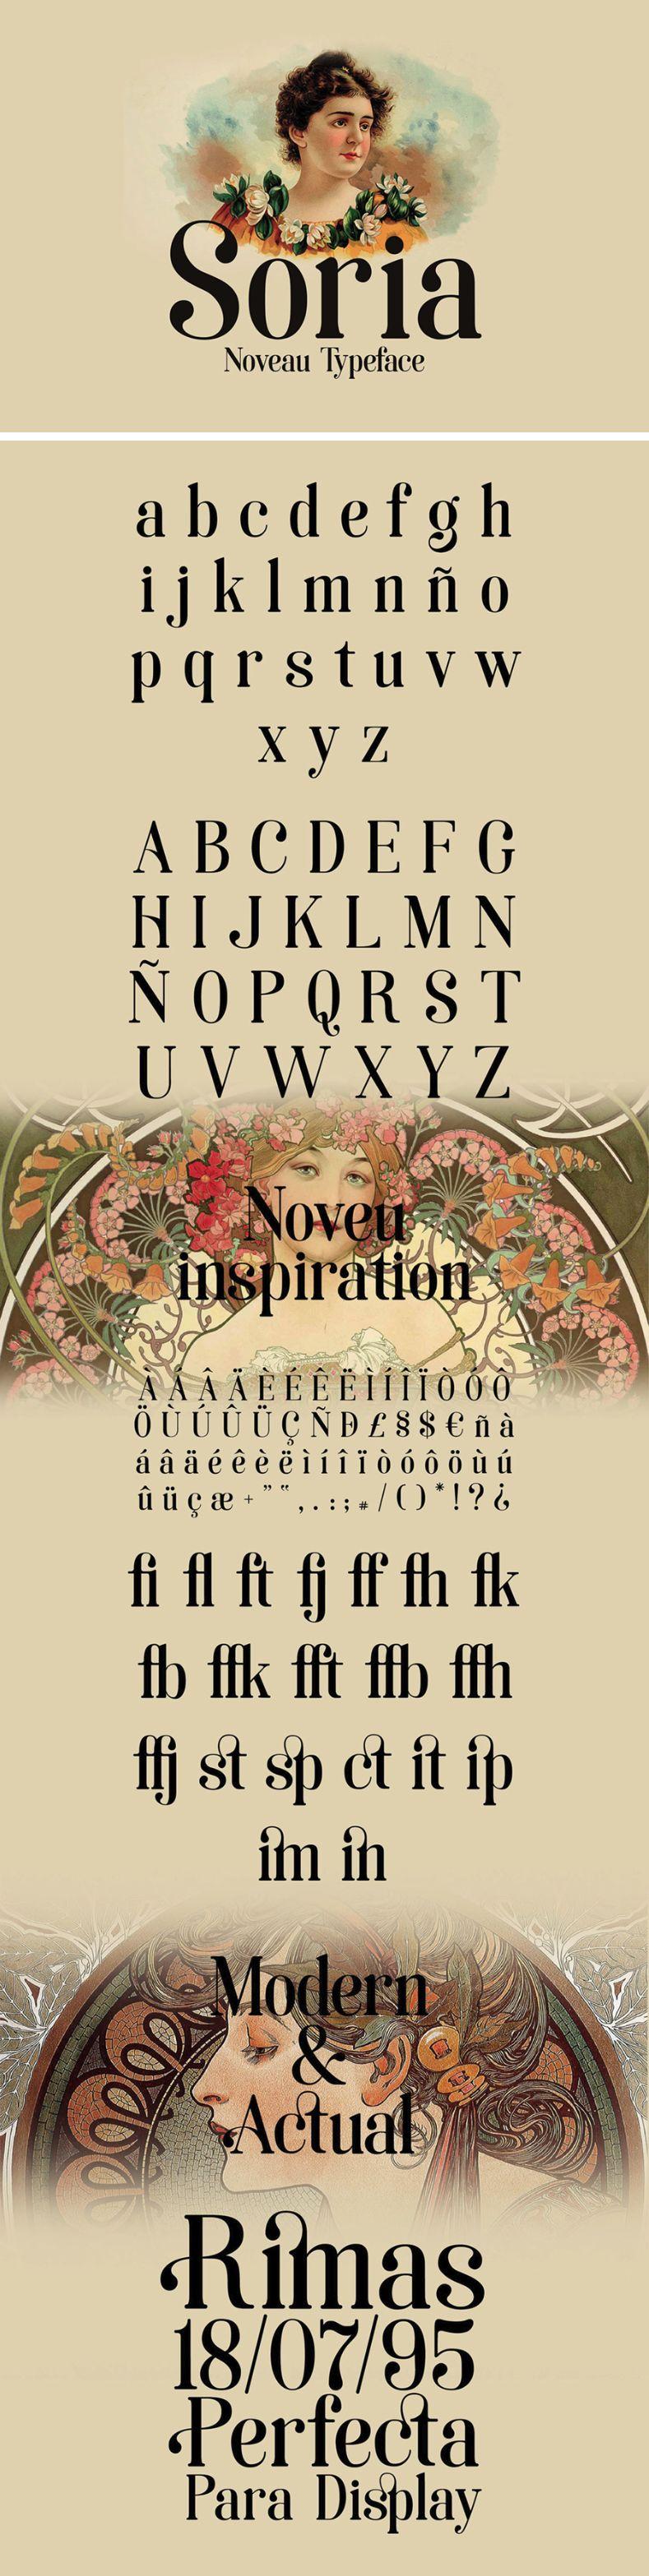 Soria Free Serif Font - Free Fonts